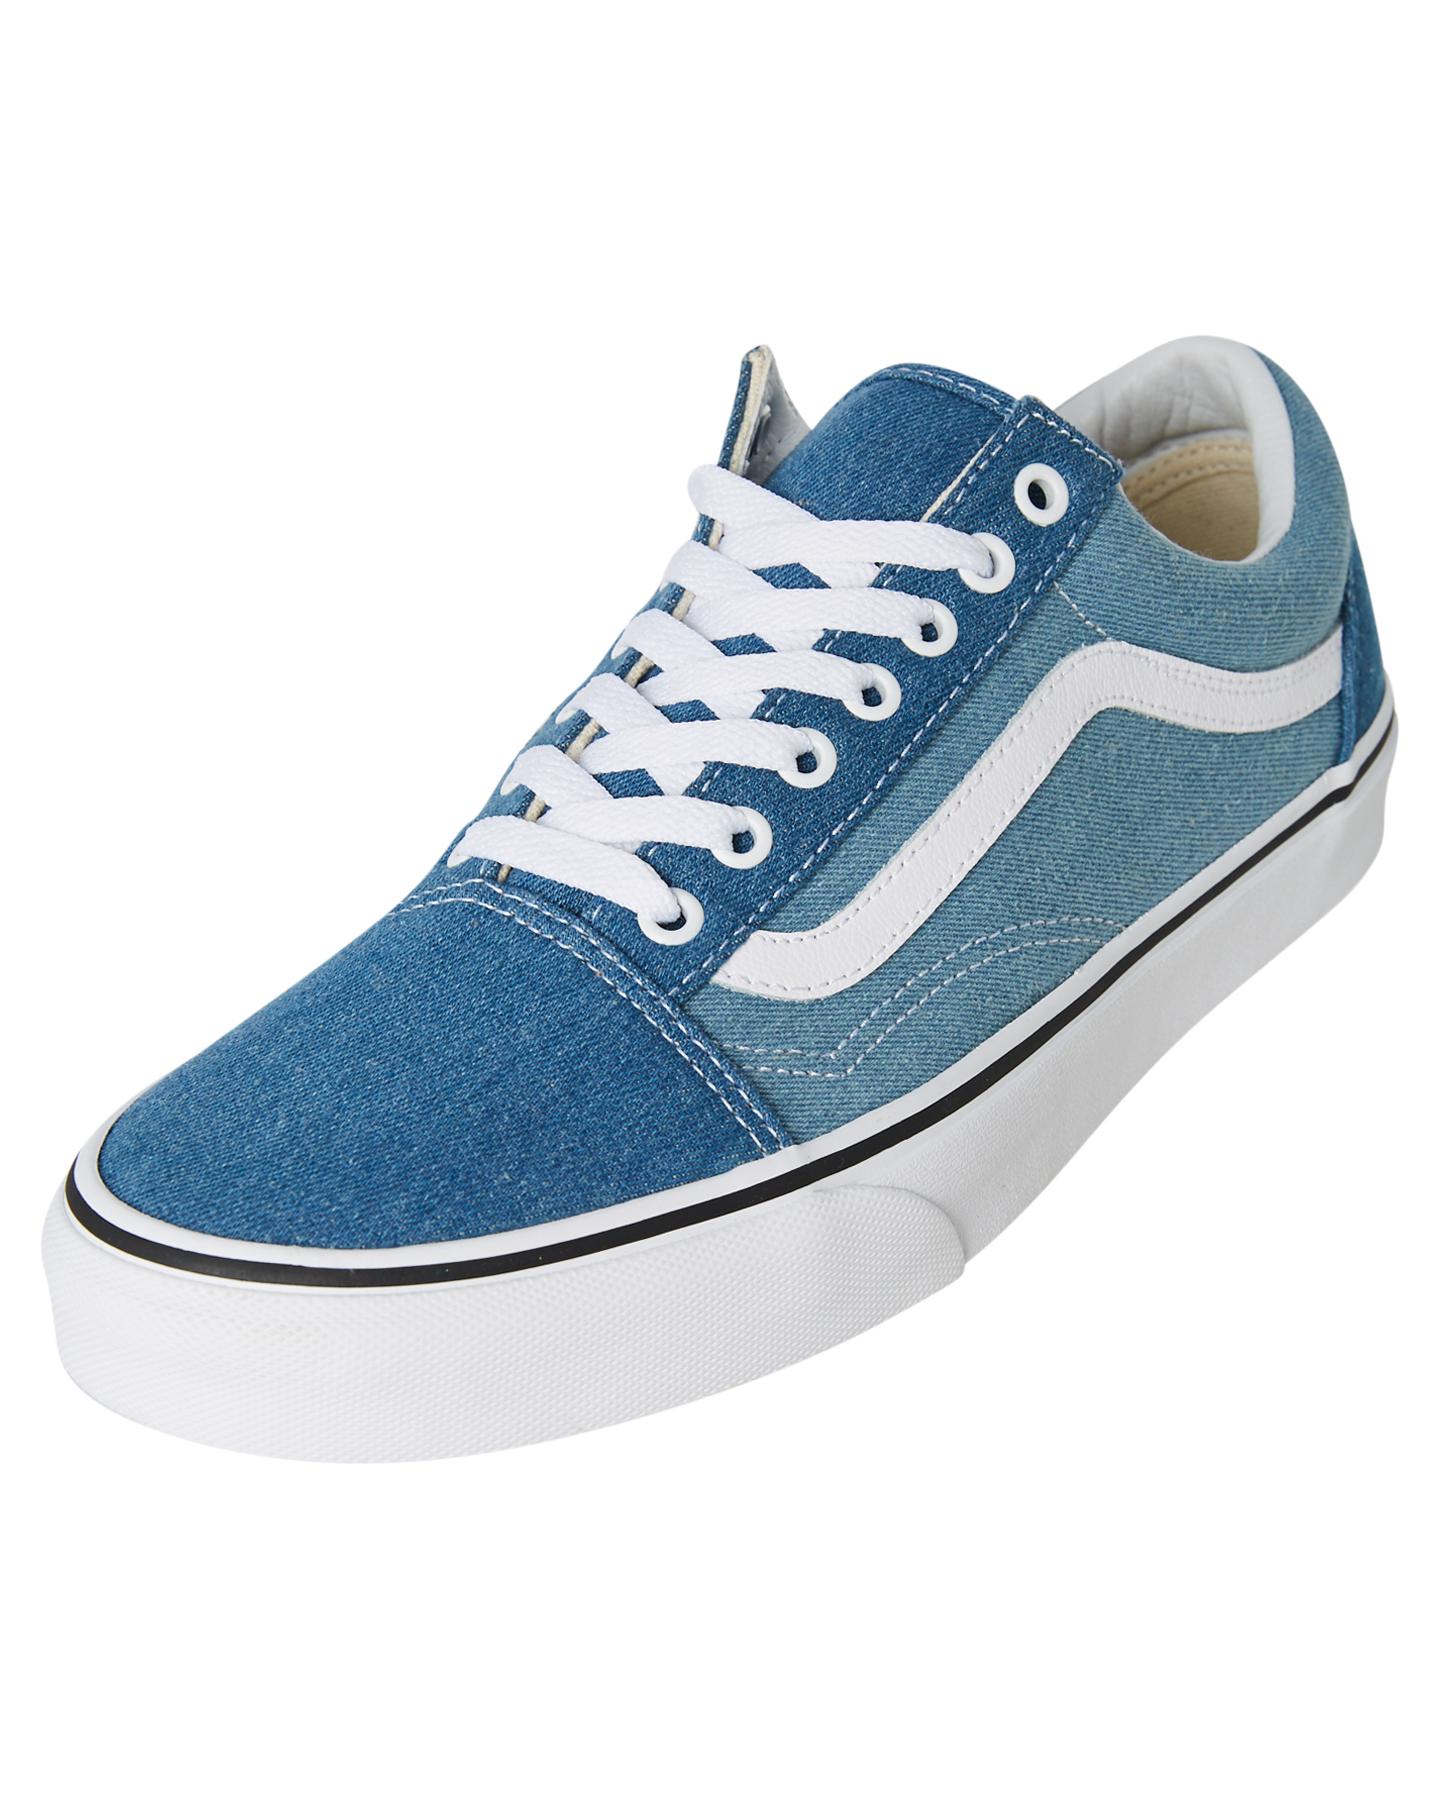 b079071624 New Vans Skate Men s Mens Old Skool Denim 2 Tone Shoe Rubber Canvas ...